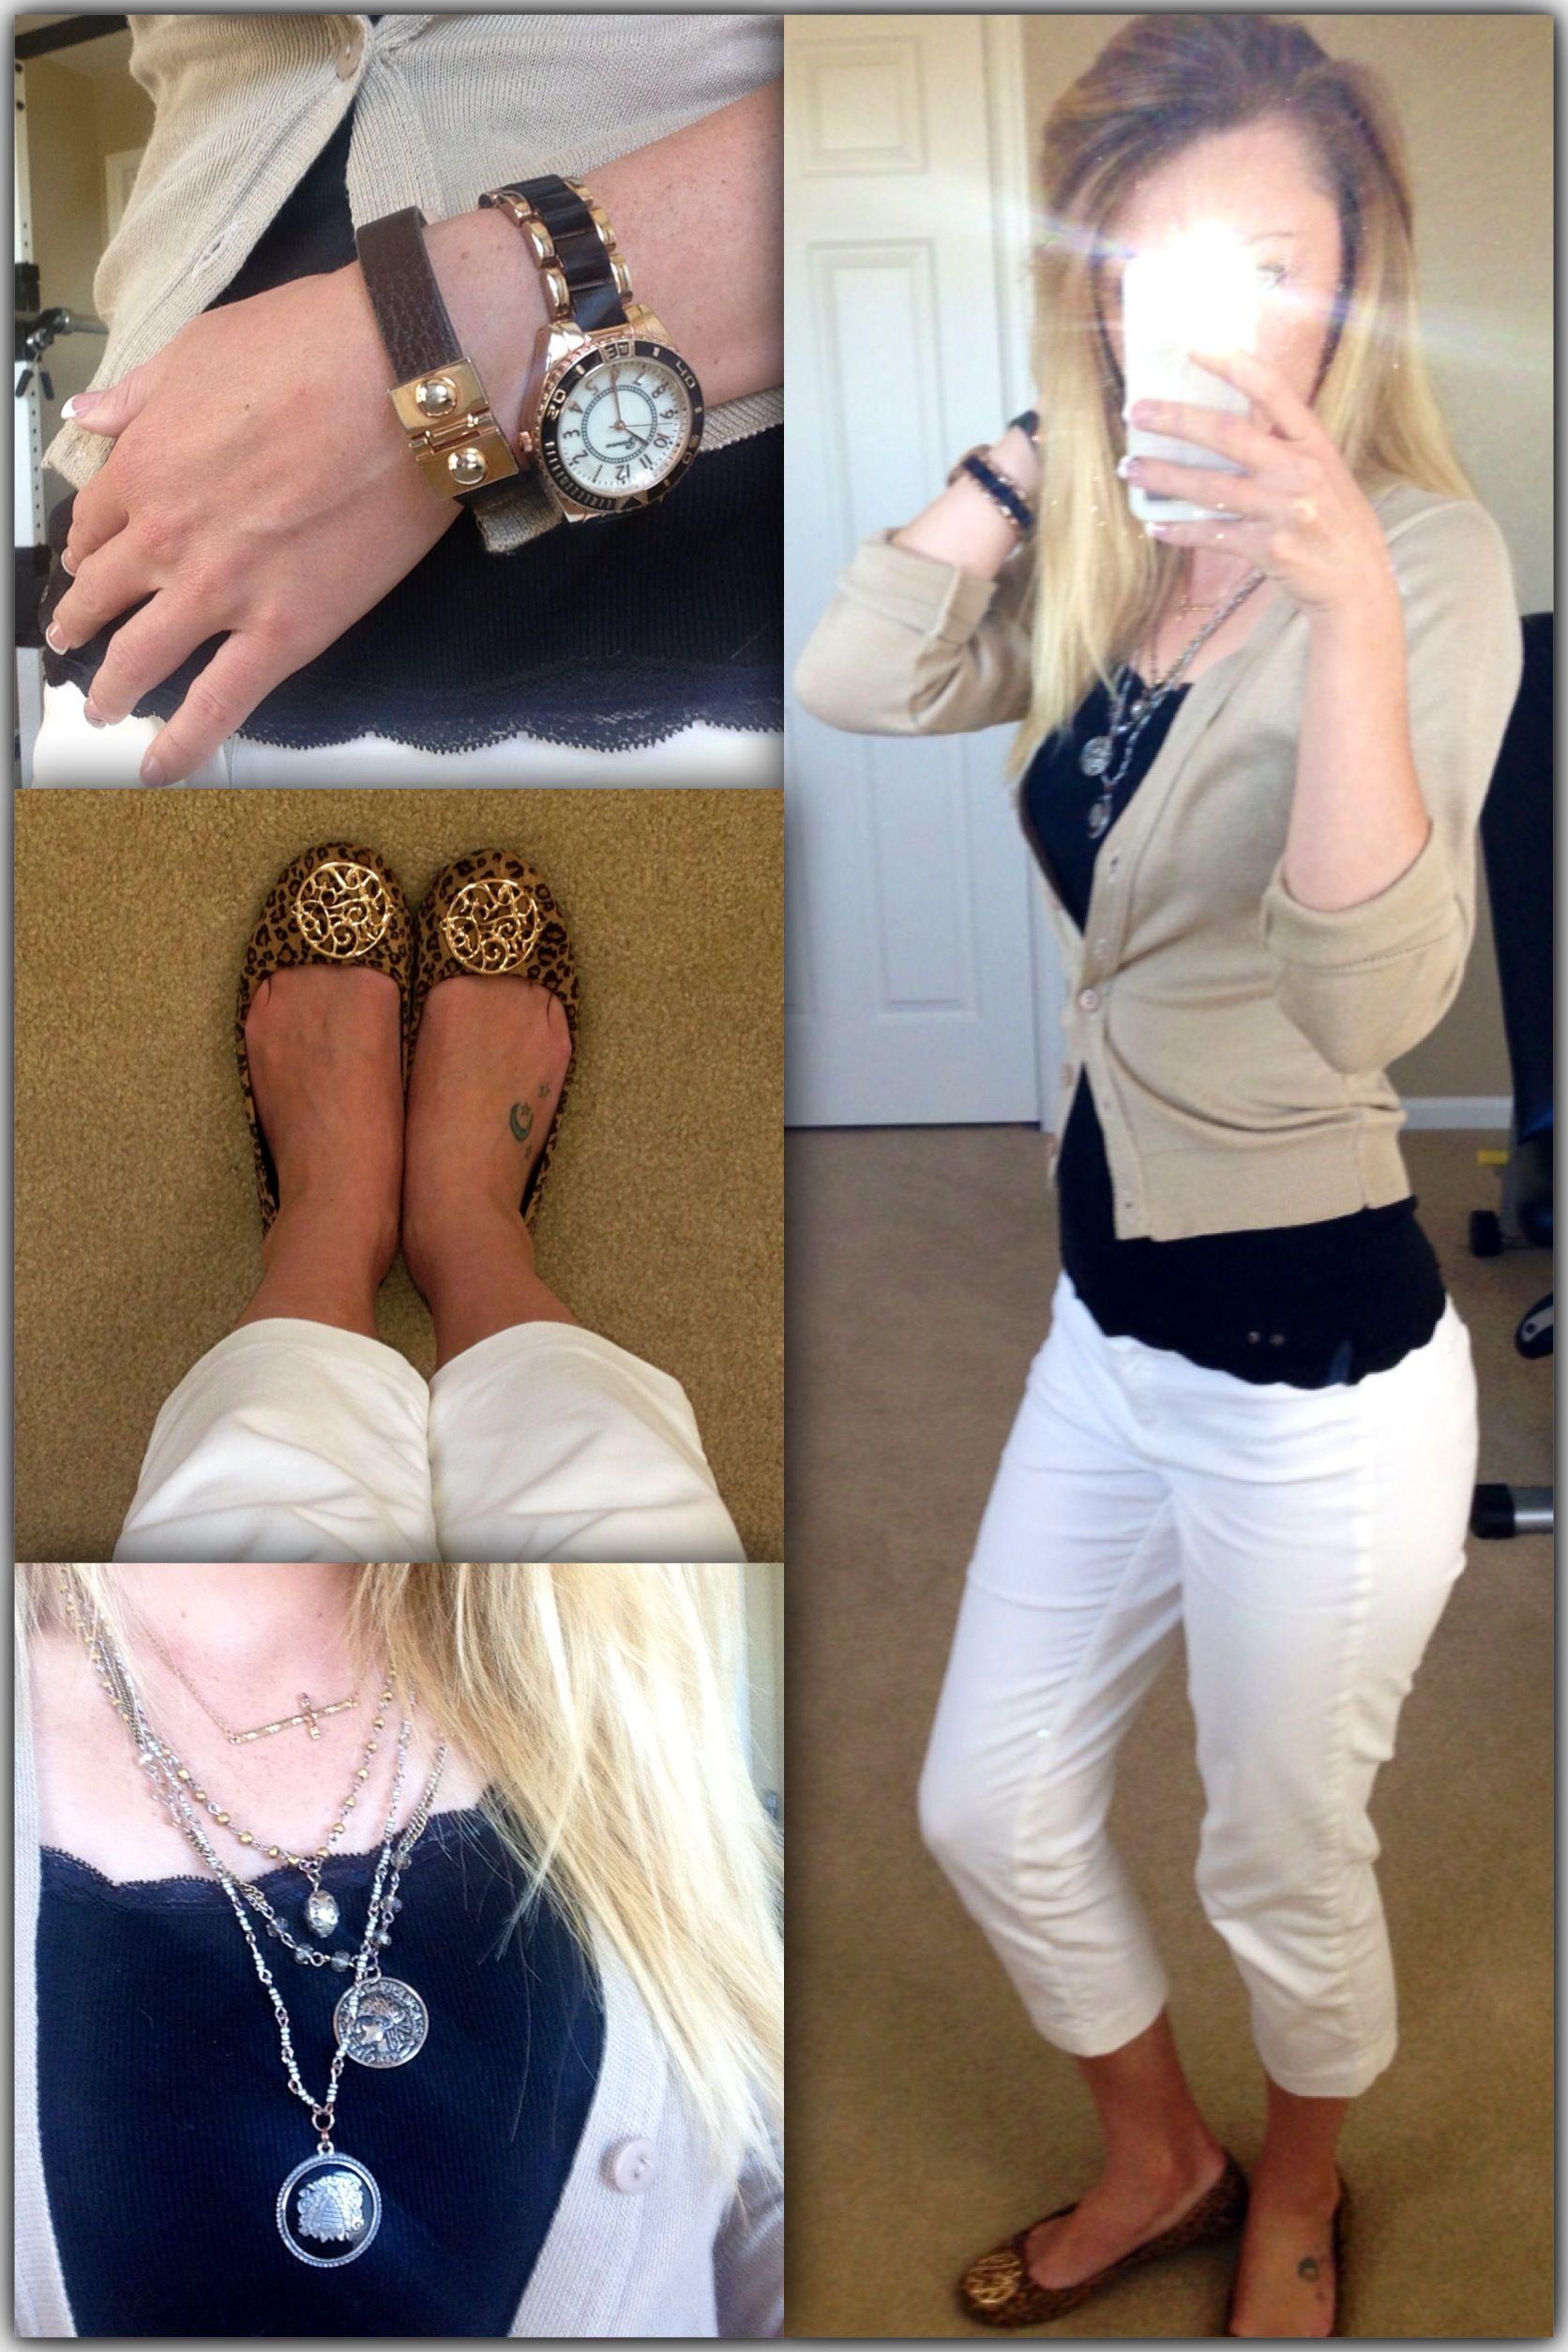 office leopard print. Office Casual Work Outfit : White Slacks, Tan Cardigan, Leopard Print Flats, Gold J